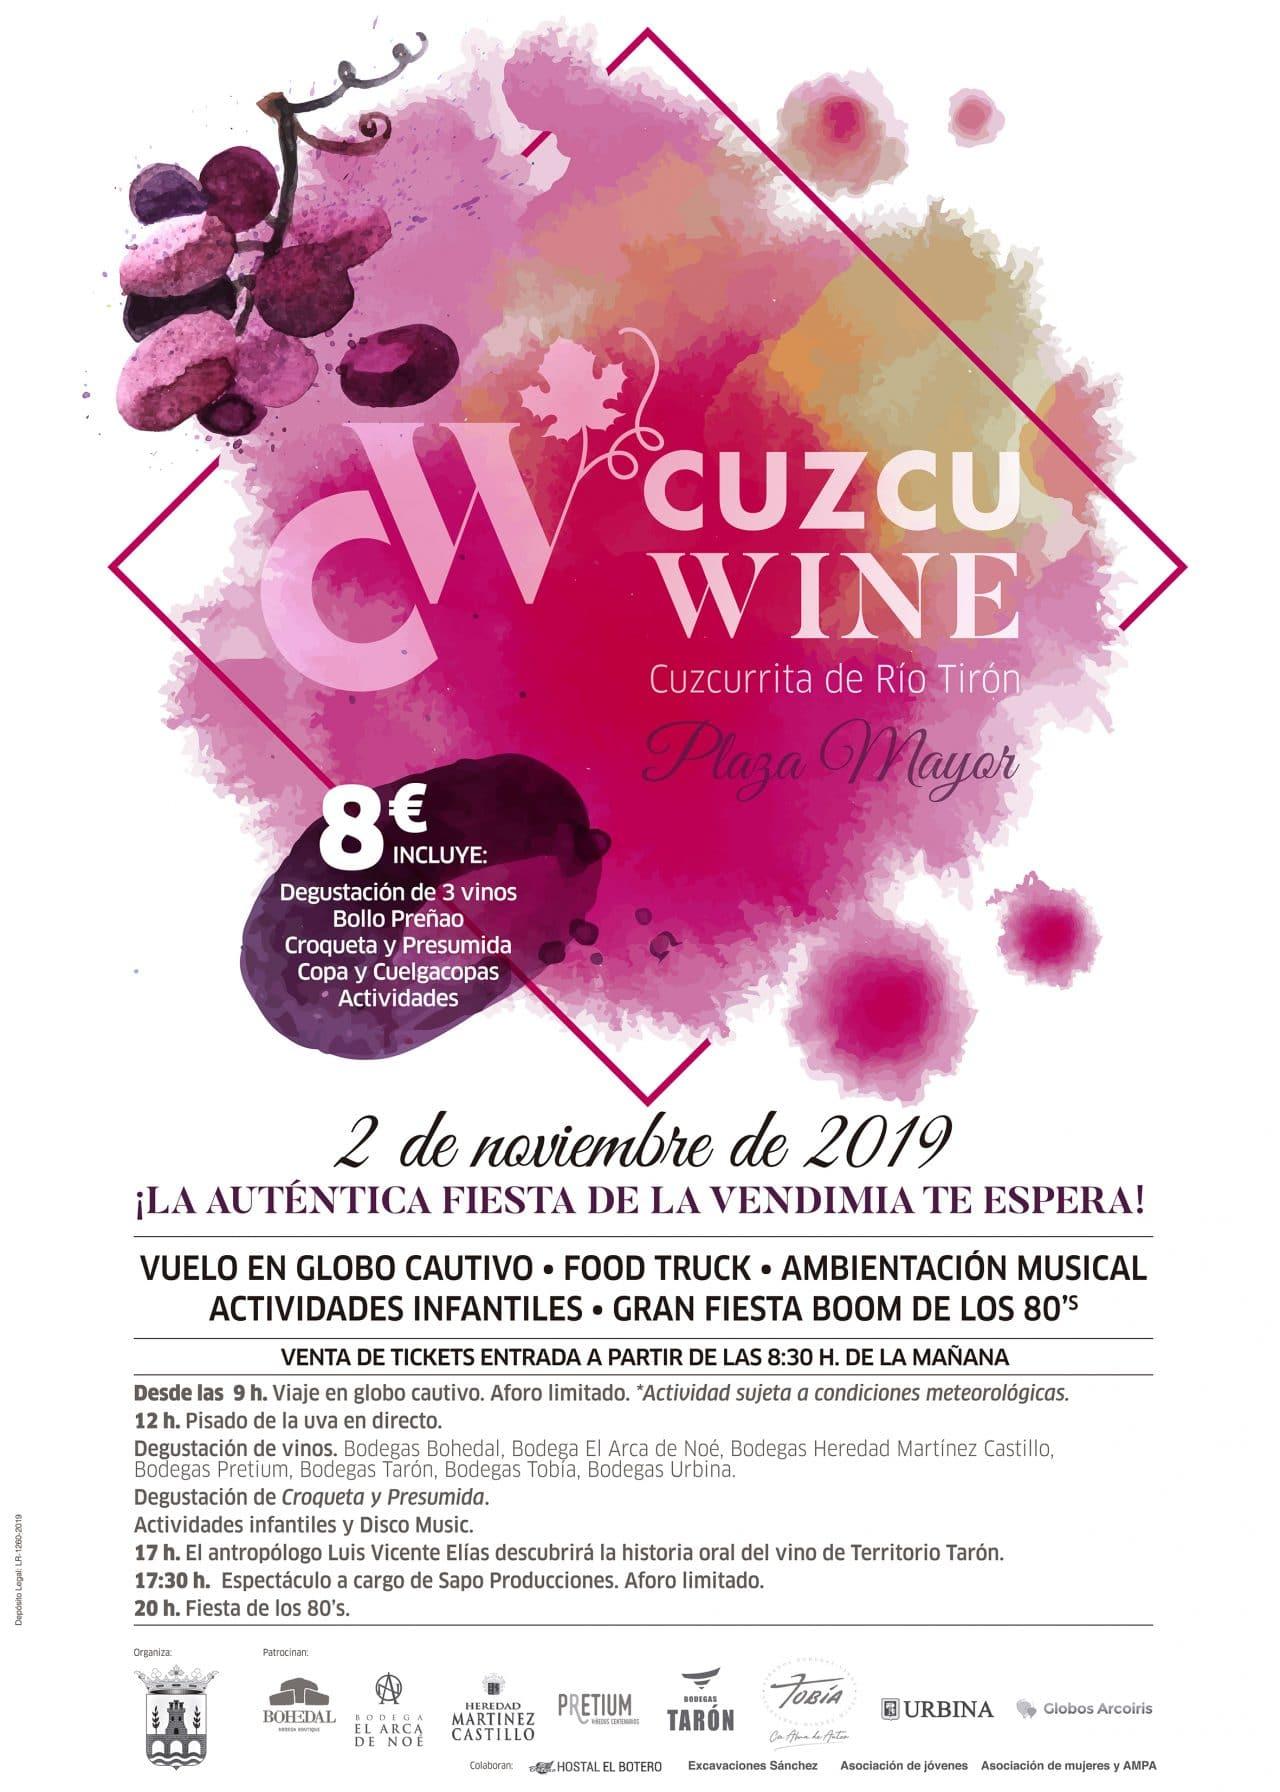 'Cuzcuwine 2019': Cuzcurrita de Río Tirón celebra este sábado una gran fiesta de la vendimia 1